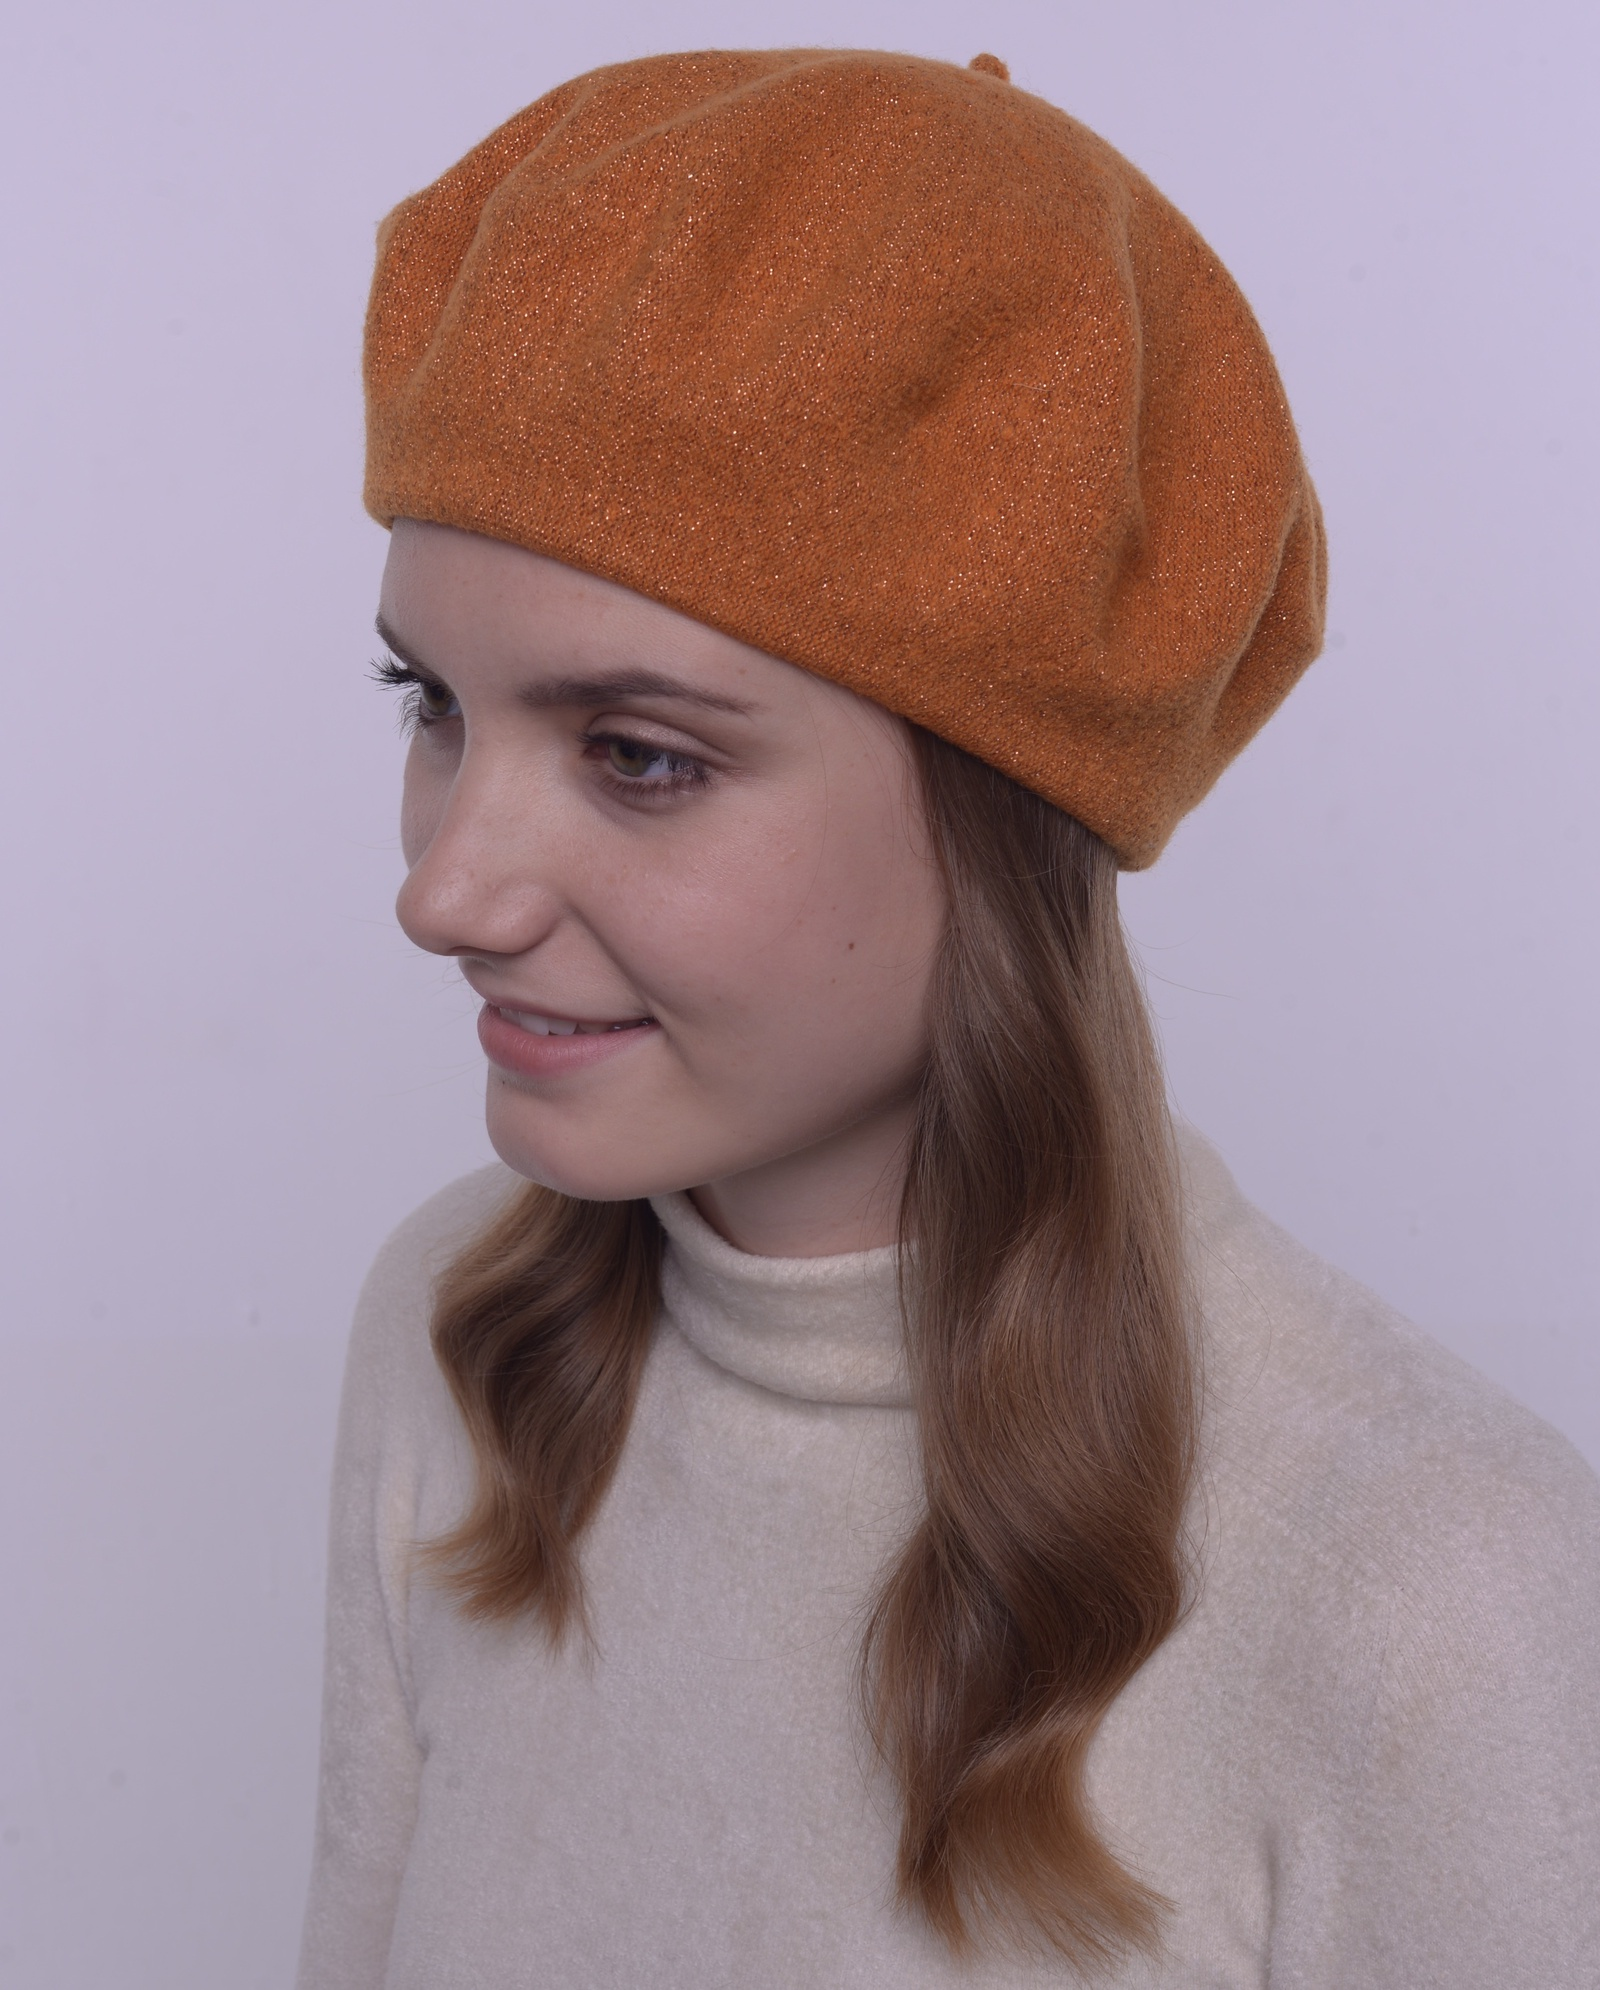 Берет FortiKnitwear берет fortiknitwear оранжевый медь 56 58 размер